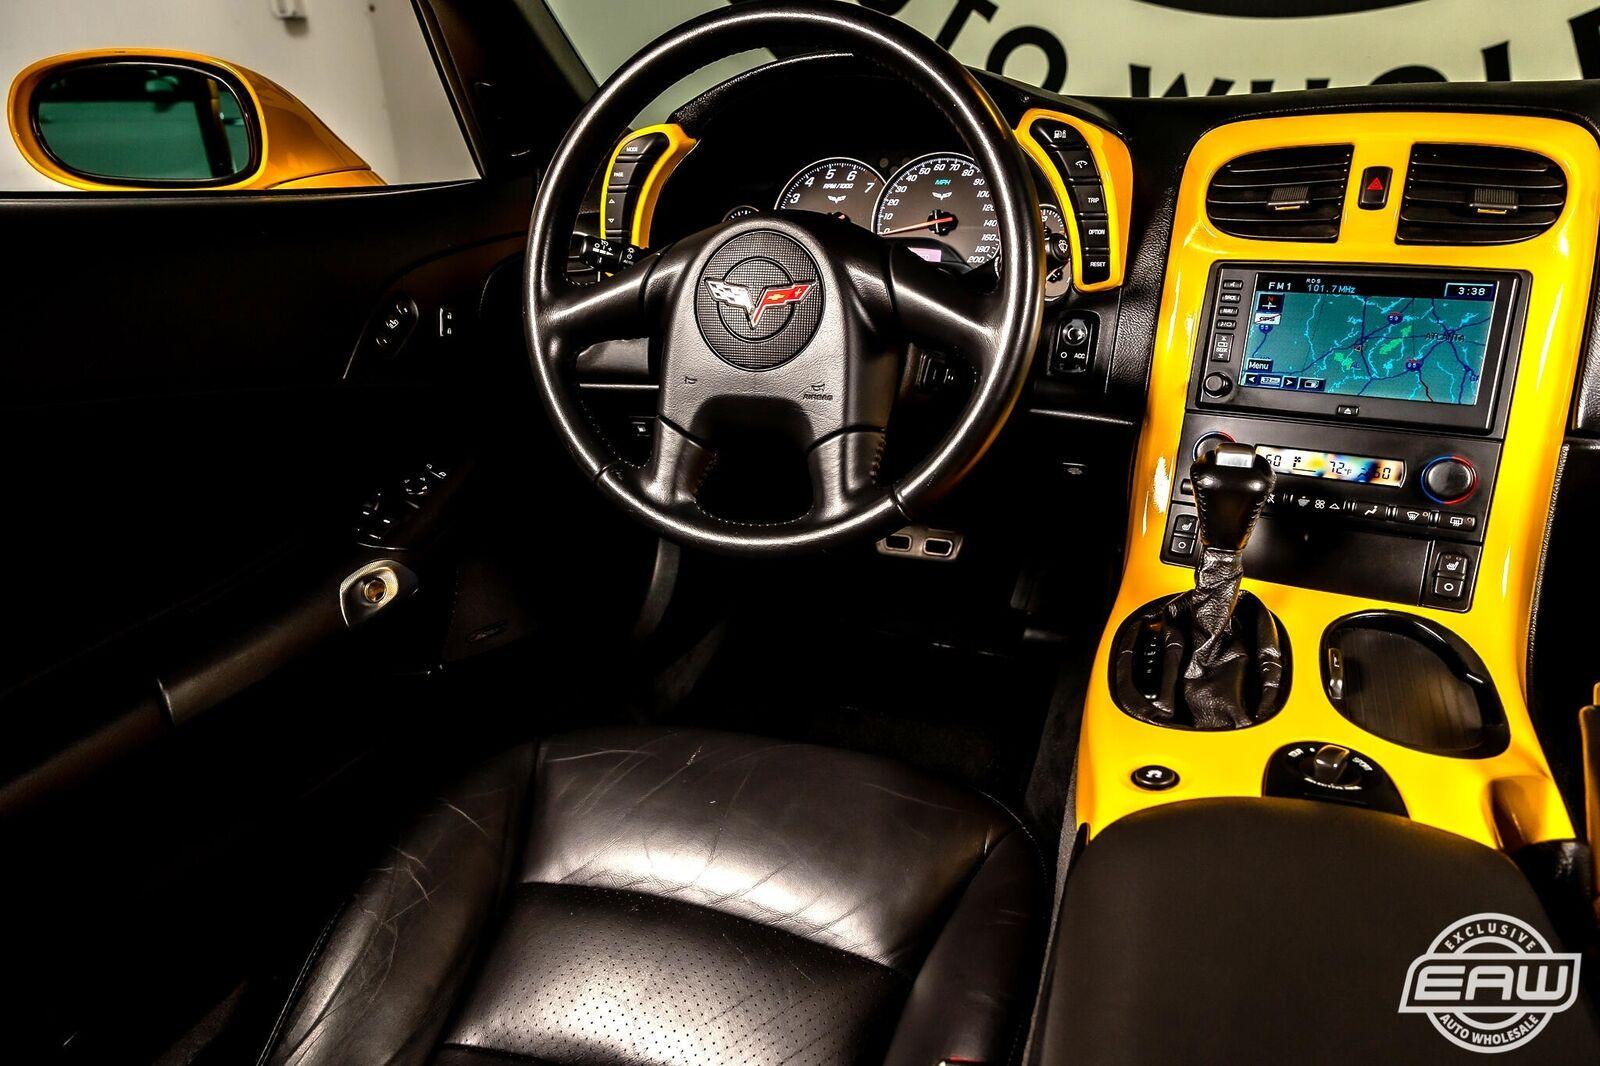 2005 Yellow Chevrolet Corvette Coupe  | C6 Corvette Photo 7